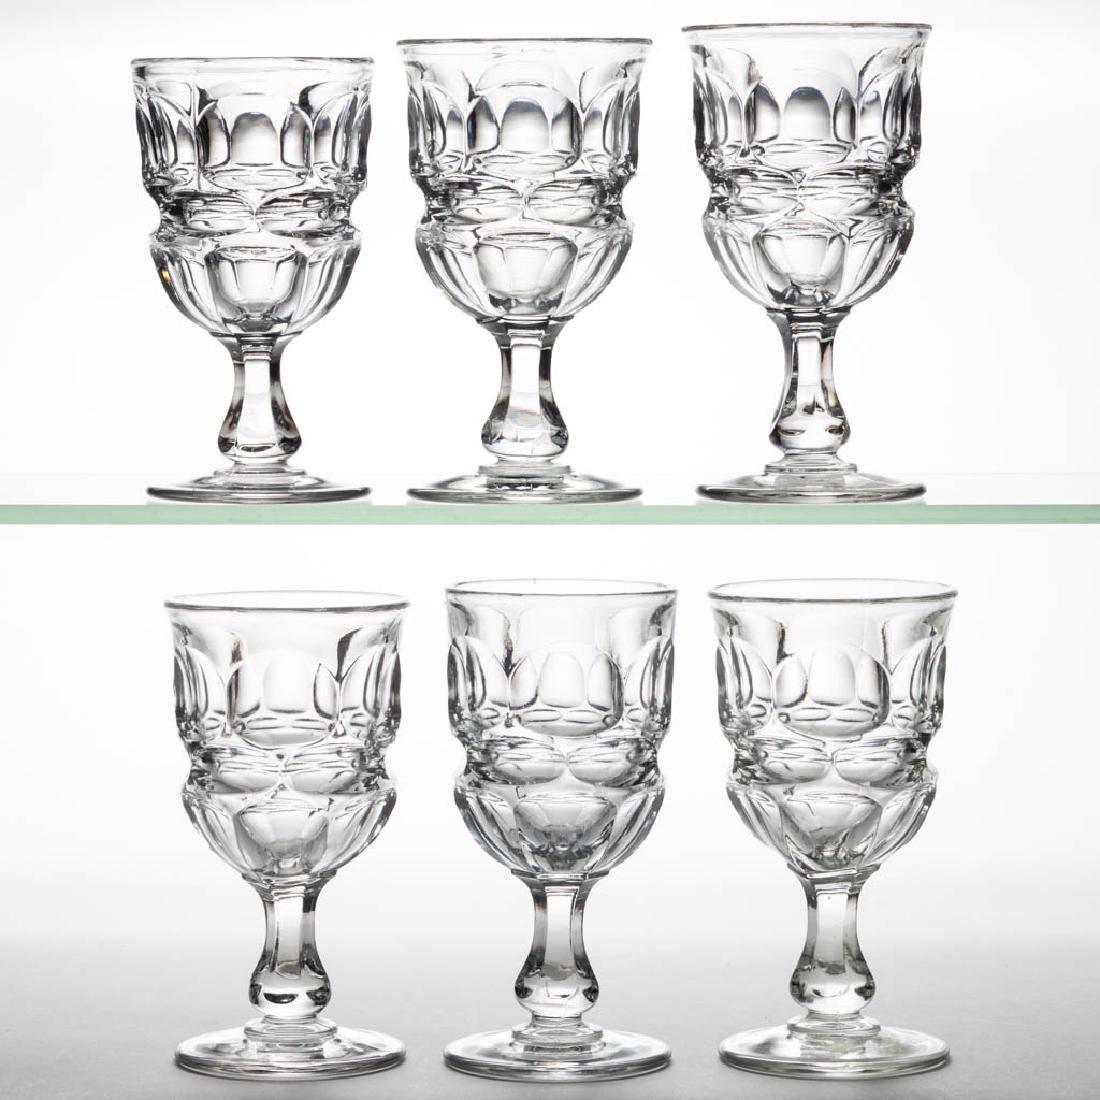 ARGUS CHAMPAGNE GLASSES, SET OF SIX